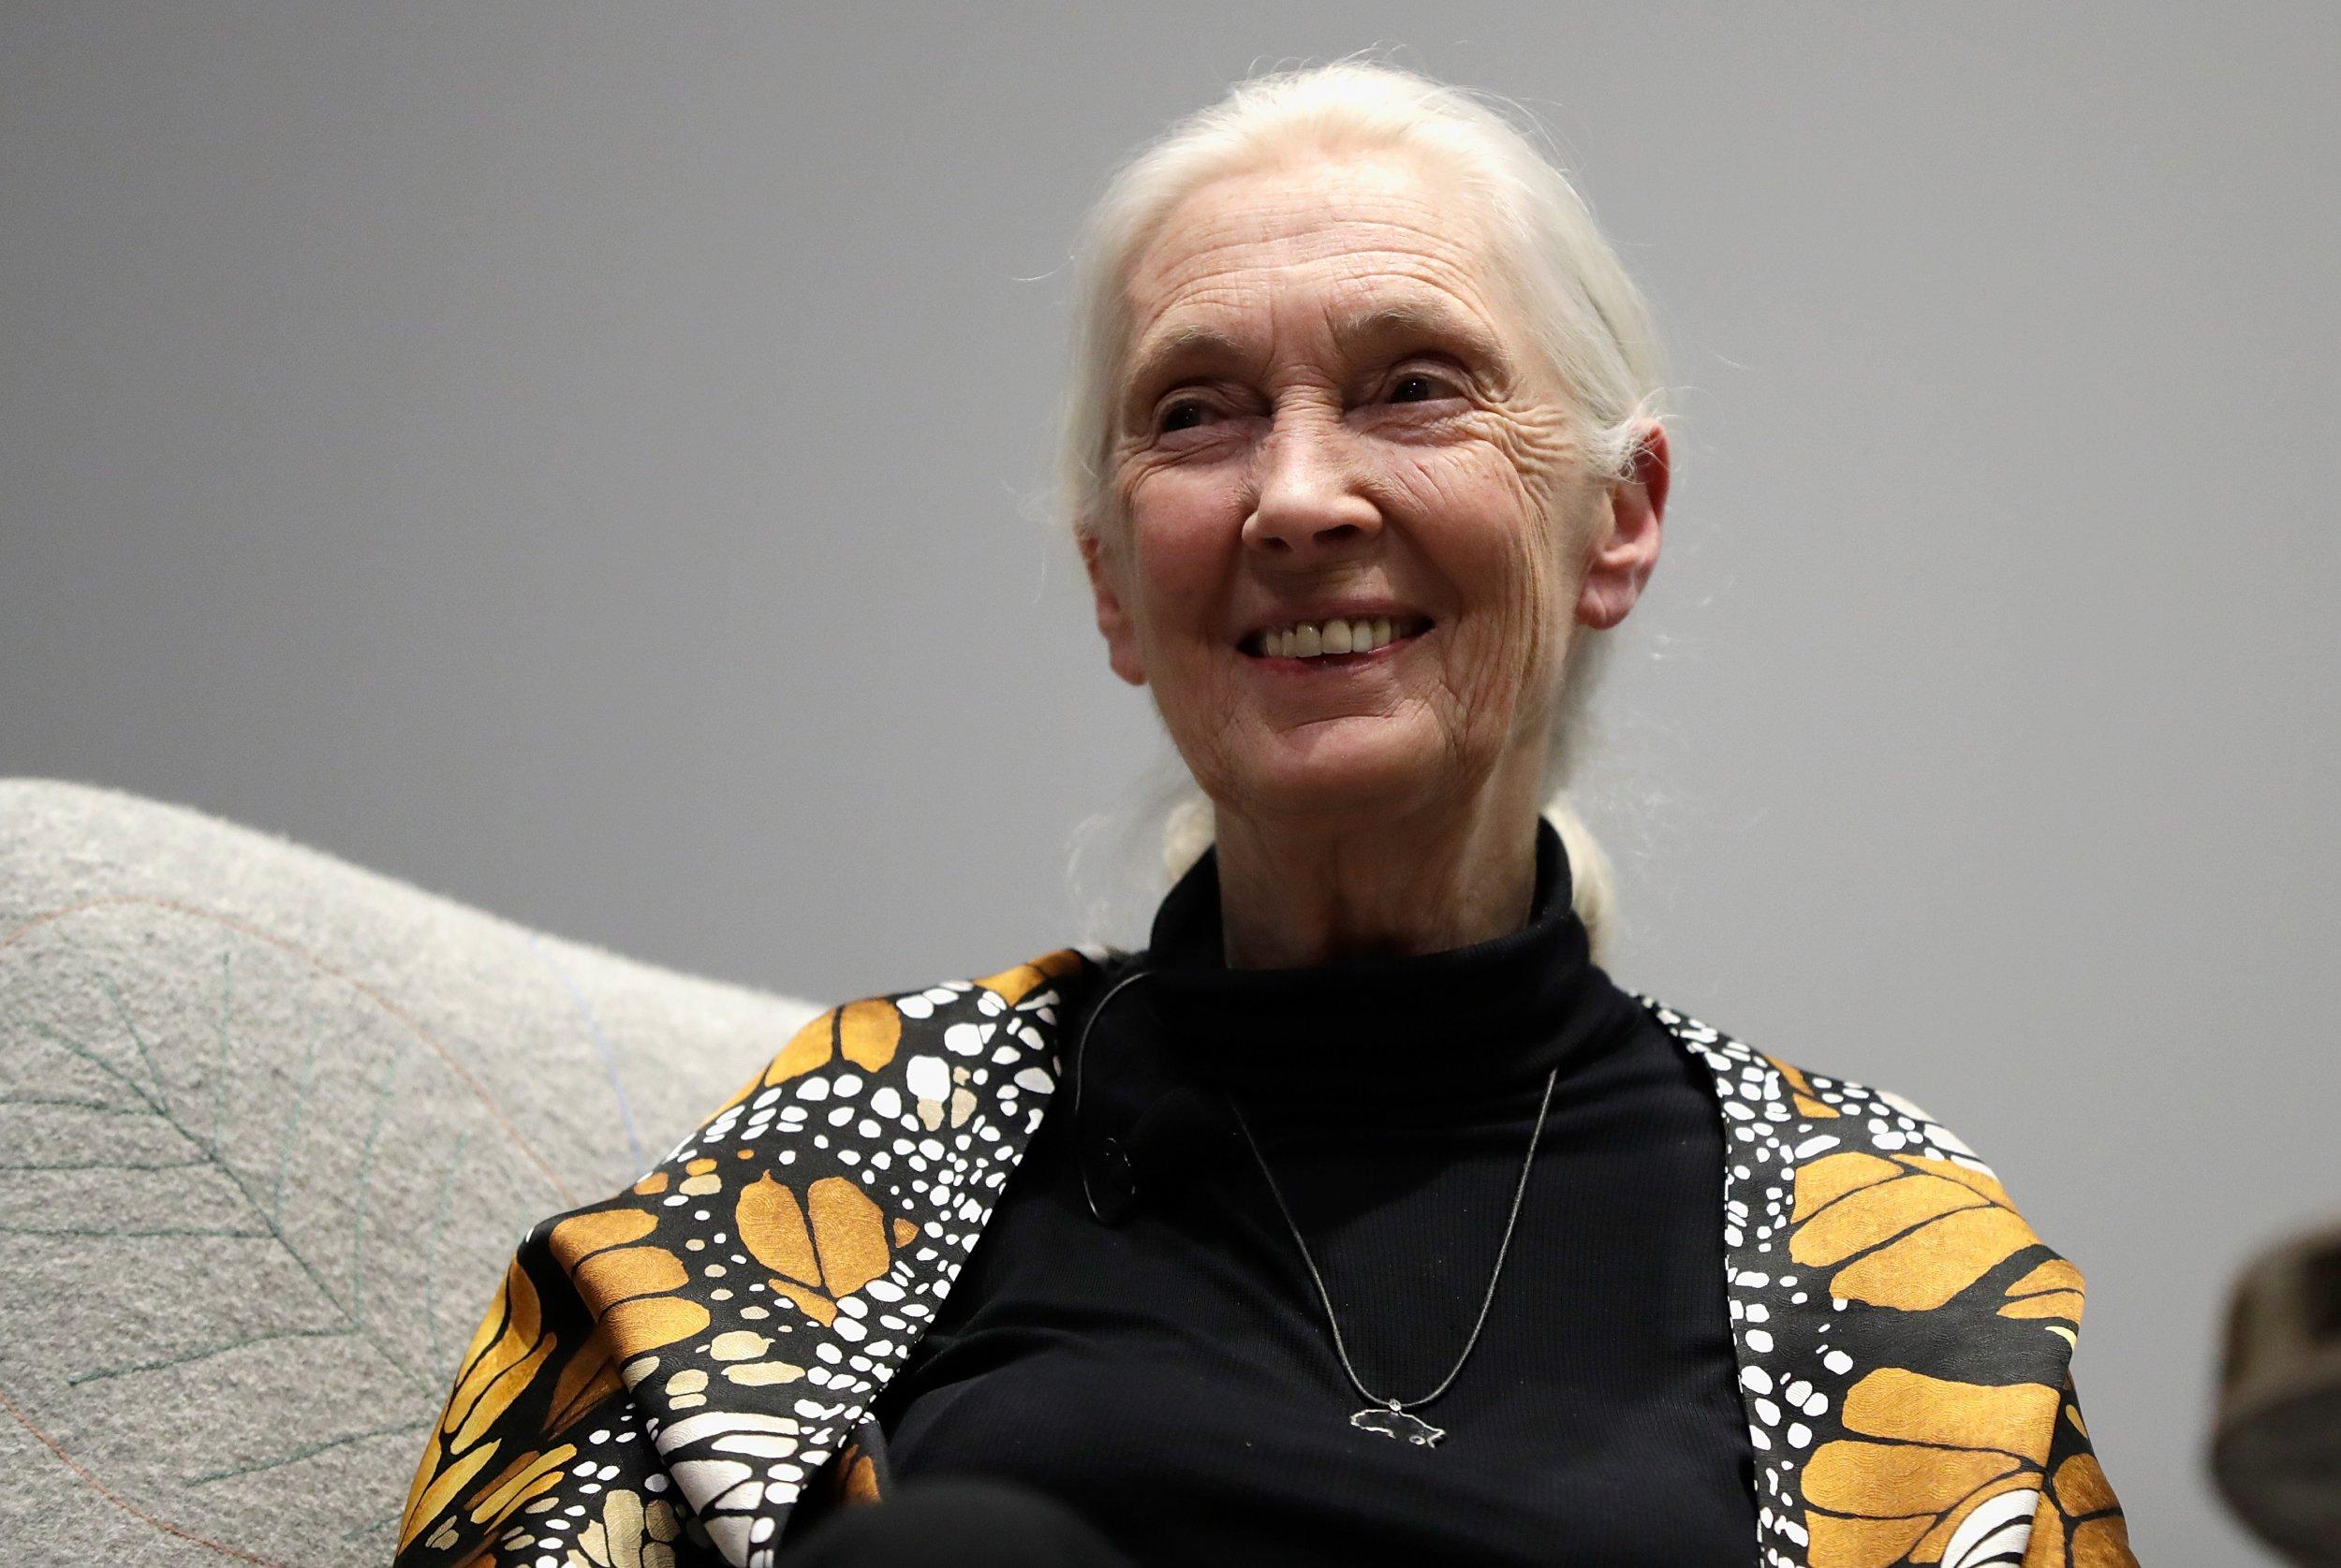 Jane Goodall on Trump's primate behavior